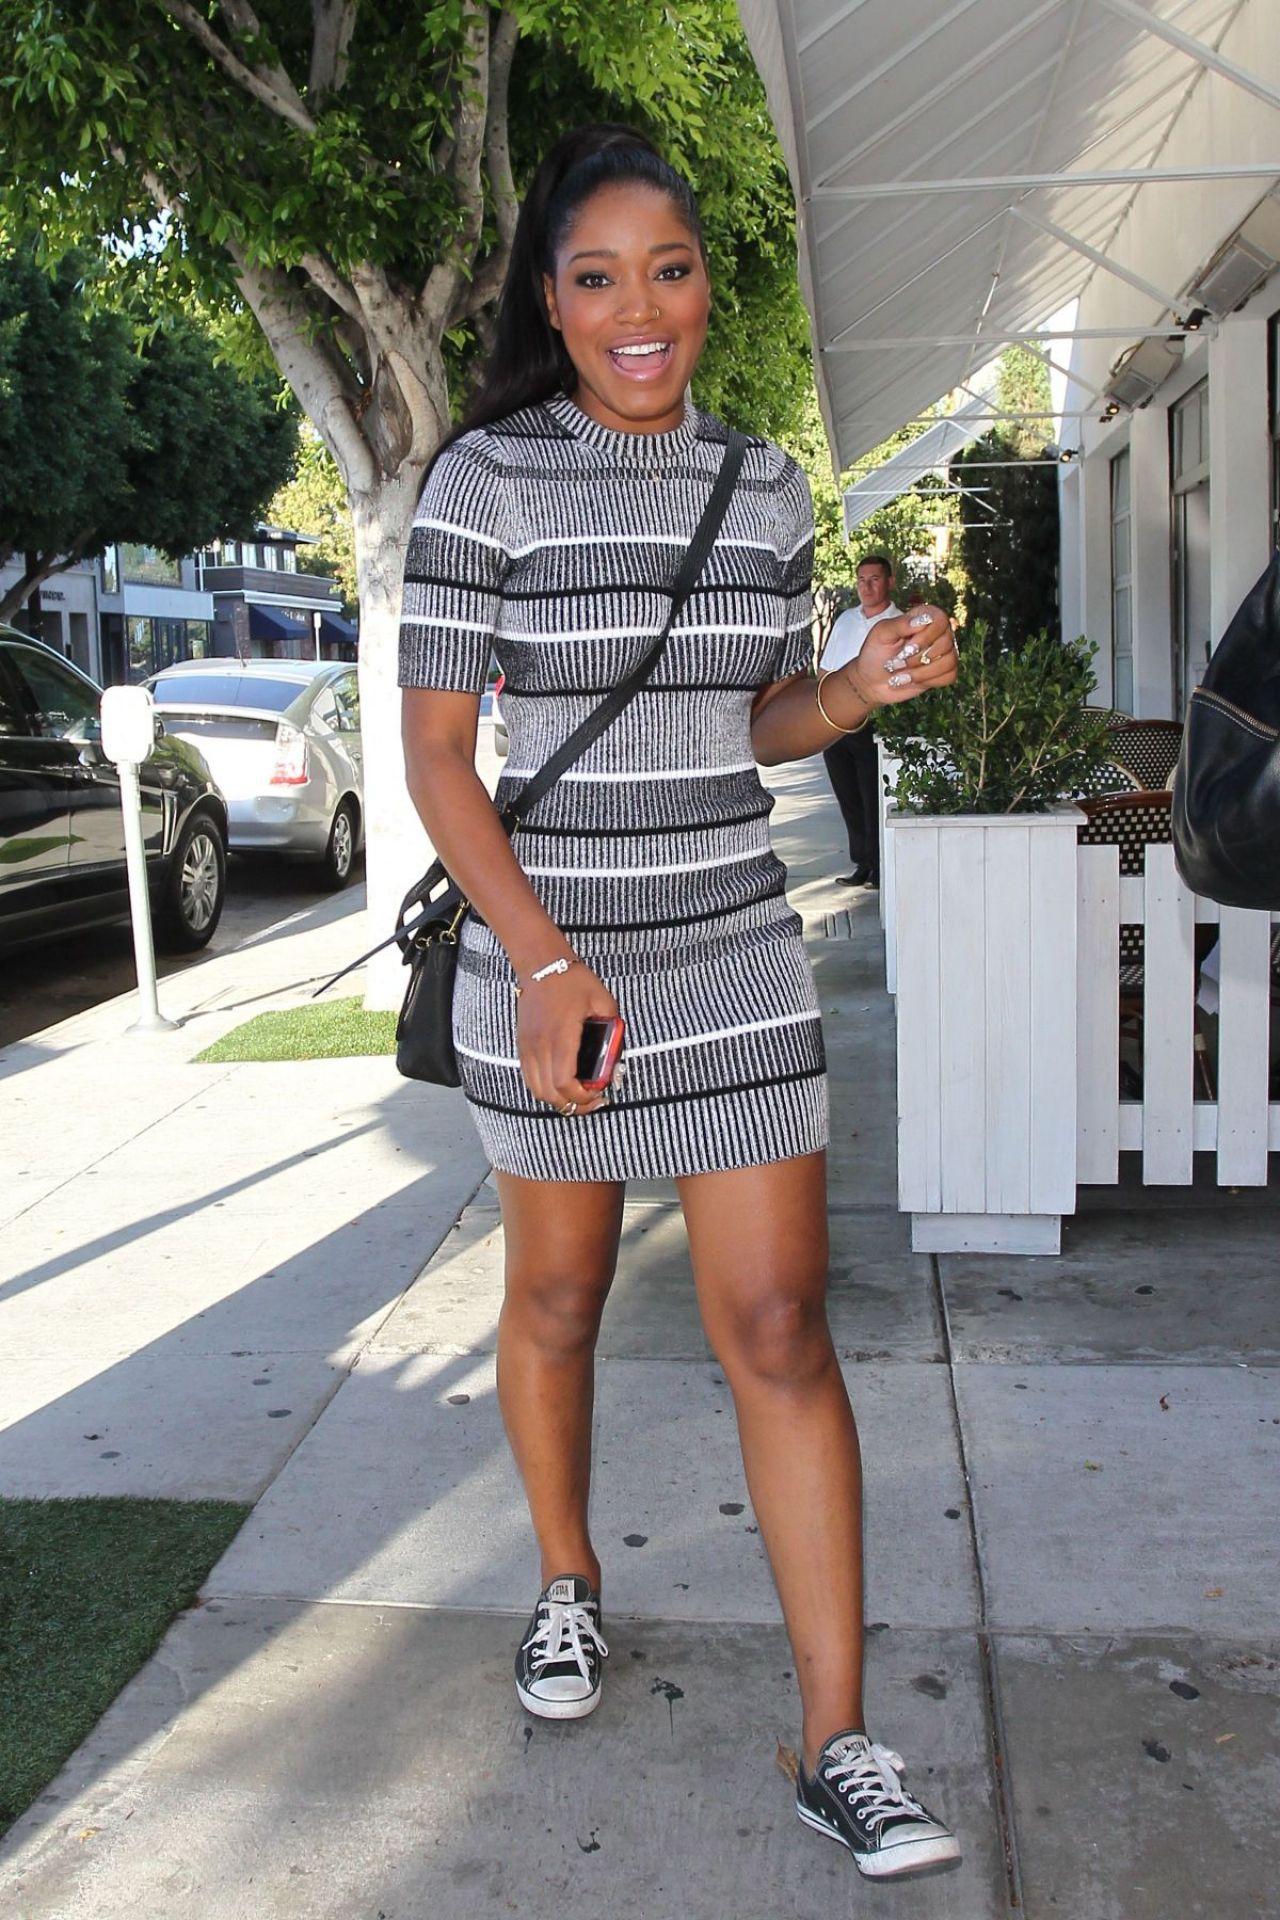 Keke Palmer Celebrates Her Birthday in Malibu - August 2014 |Keke Palmer 2014